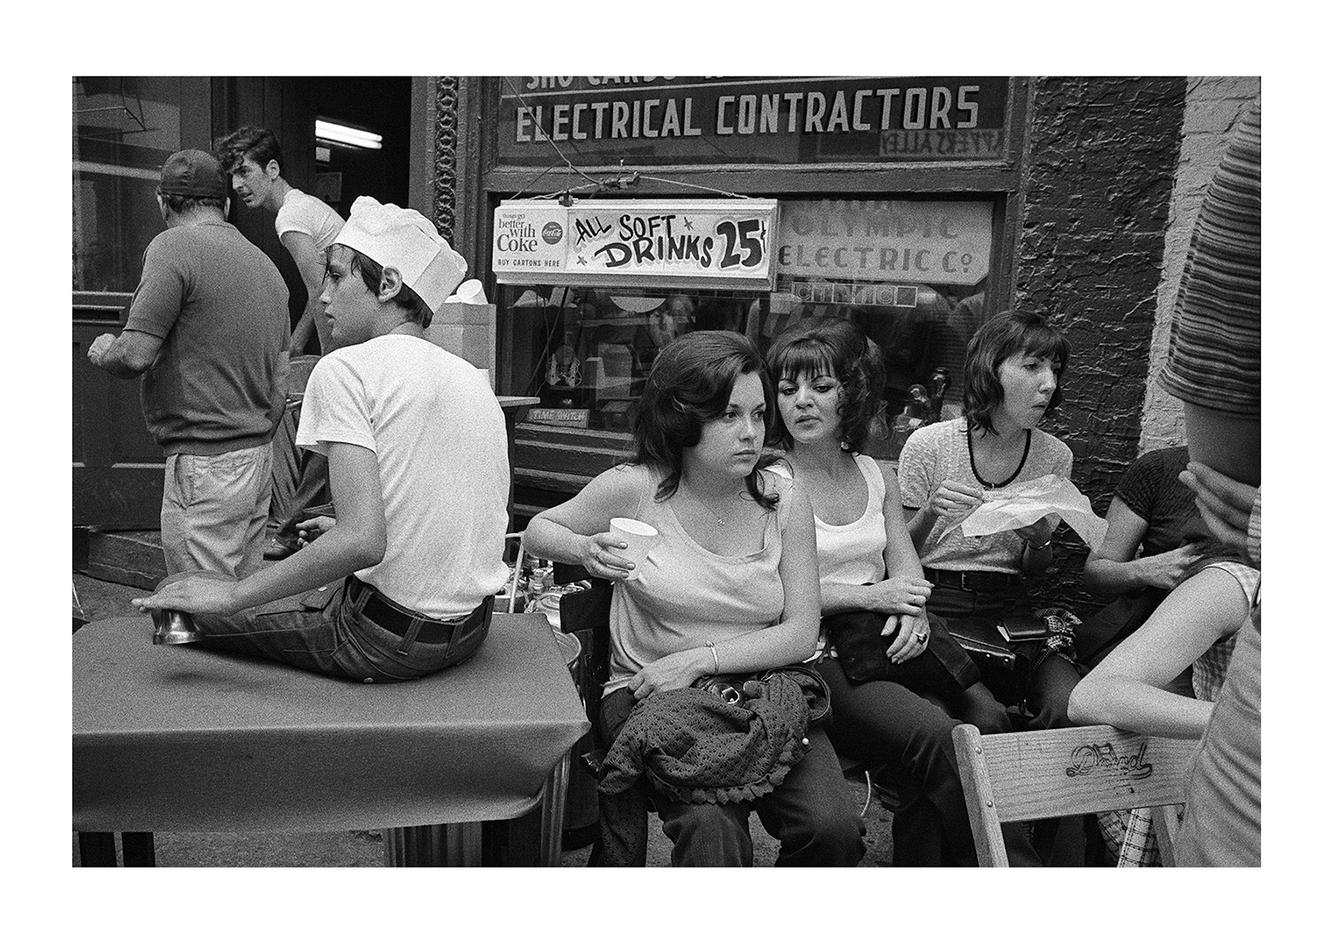 A Group at a Greek Festival, Greektown, Detroit 1972